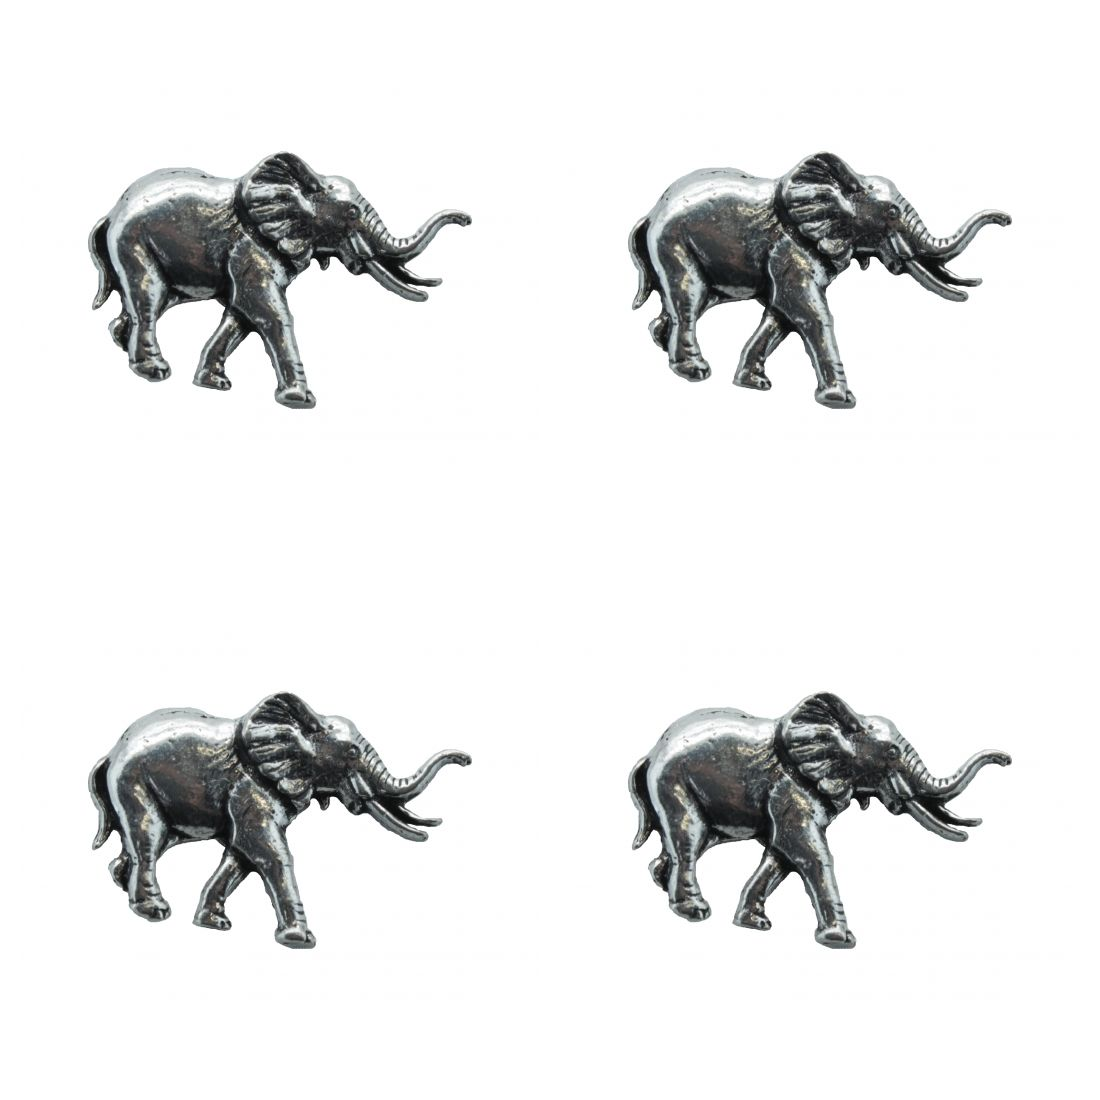 4x Pin Anstecker Badge Elefant, 2x3.5cm